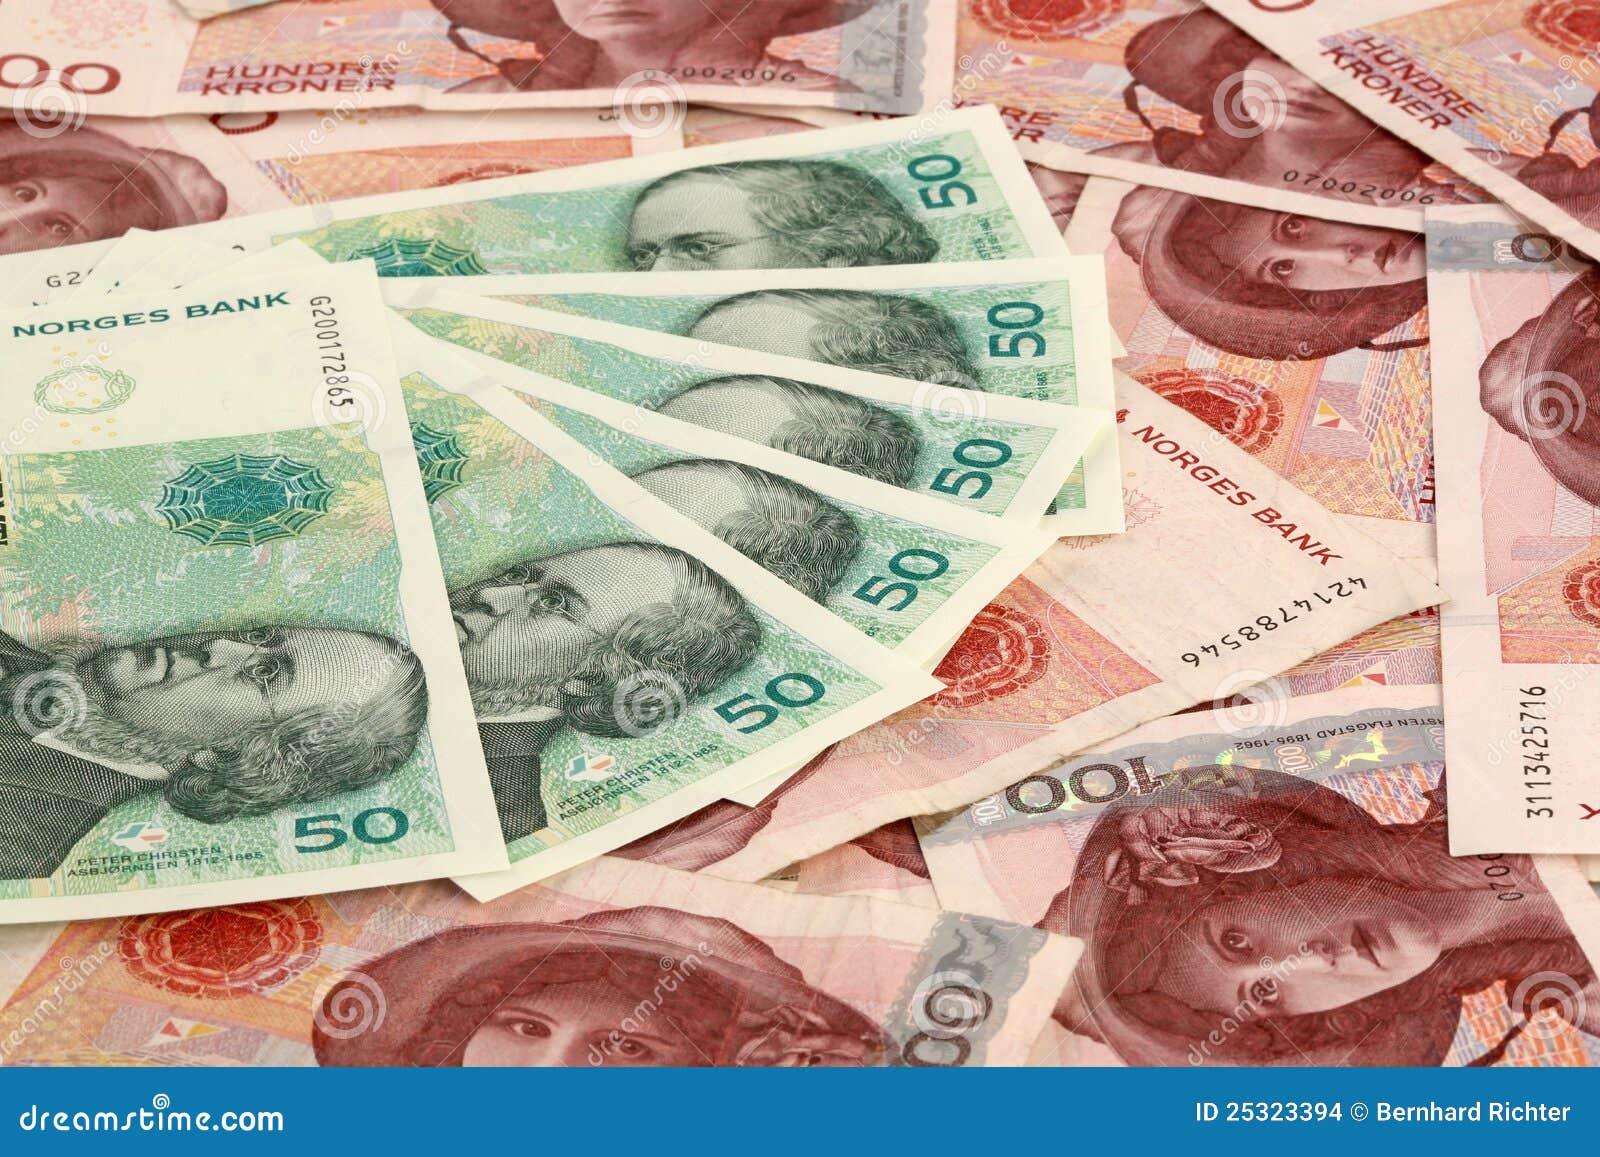 business management finance time value money paper